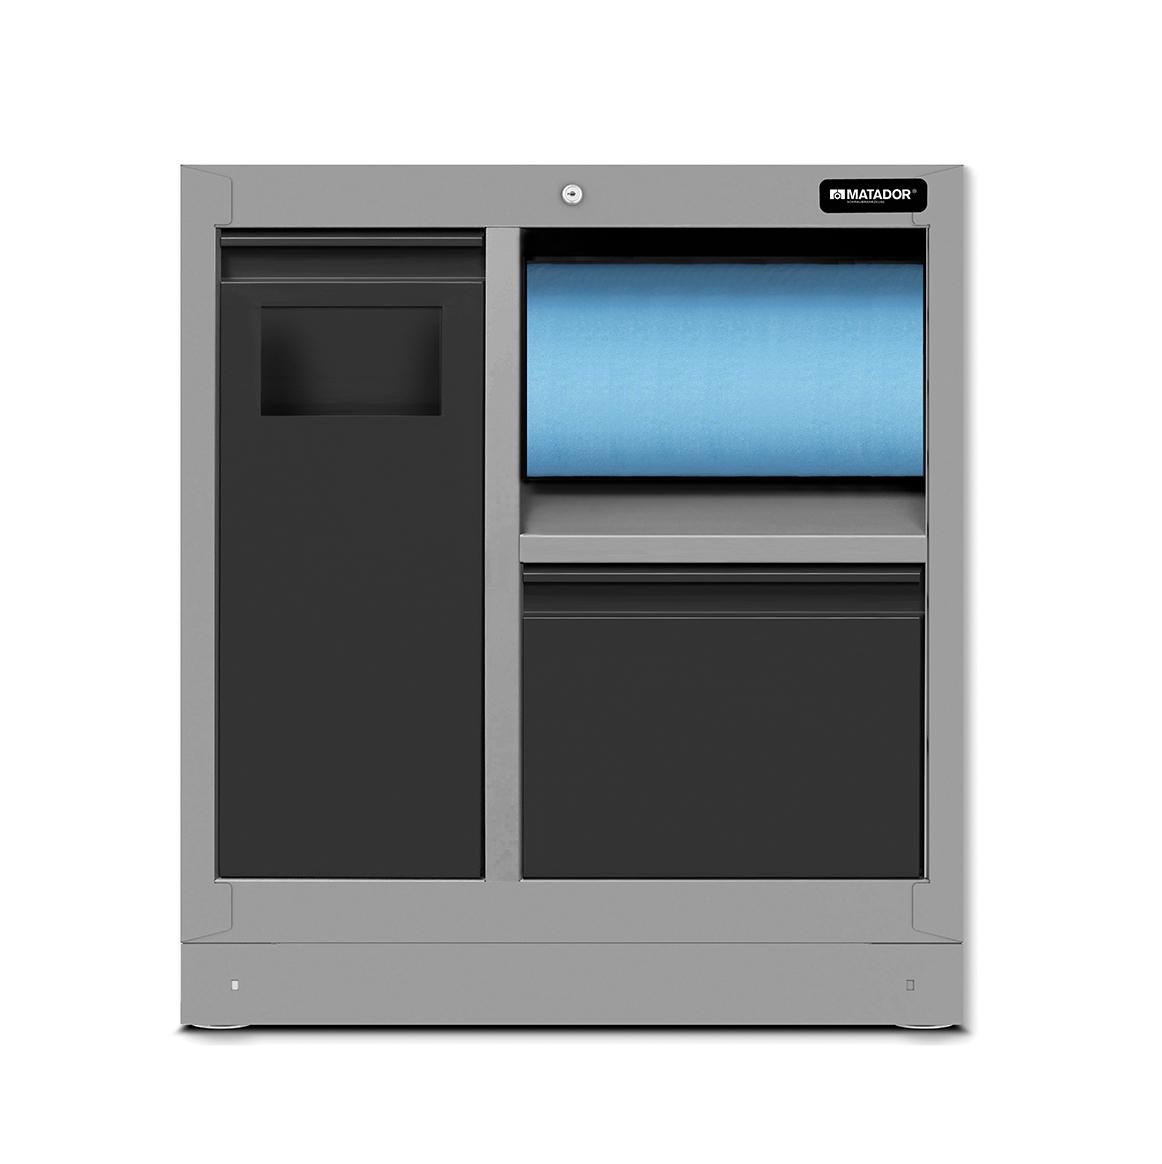 Men's Kitchen: Multifunktionsschrank L, 861 x 960 x 500 mm, MATADOR 81523404